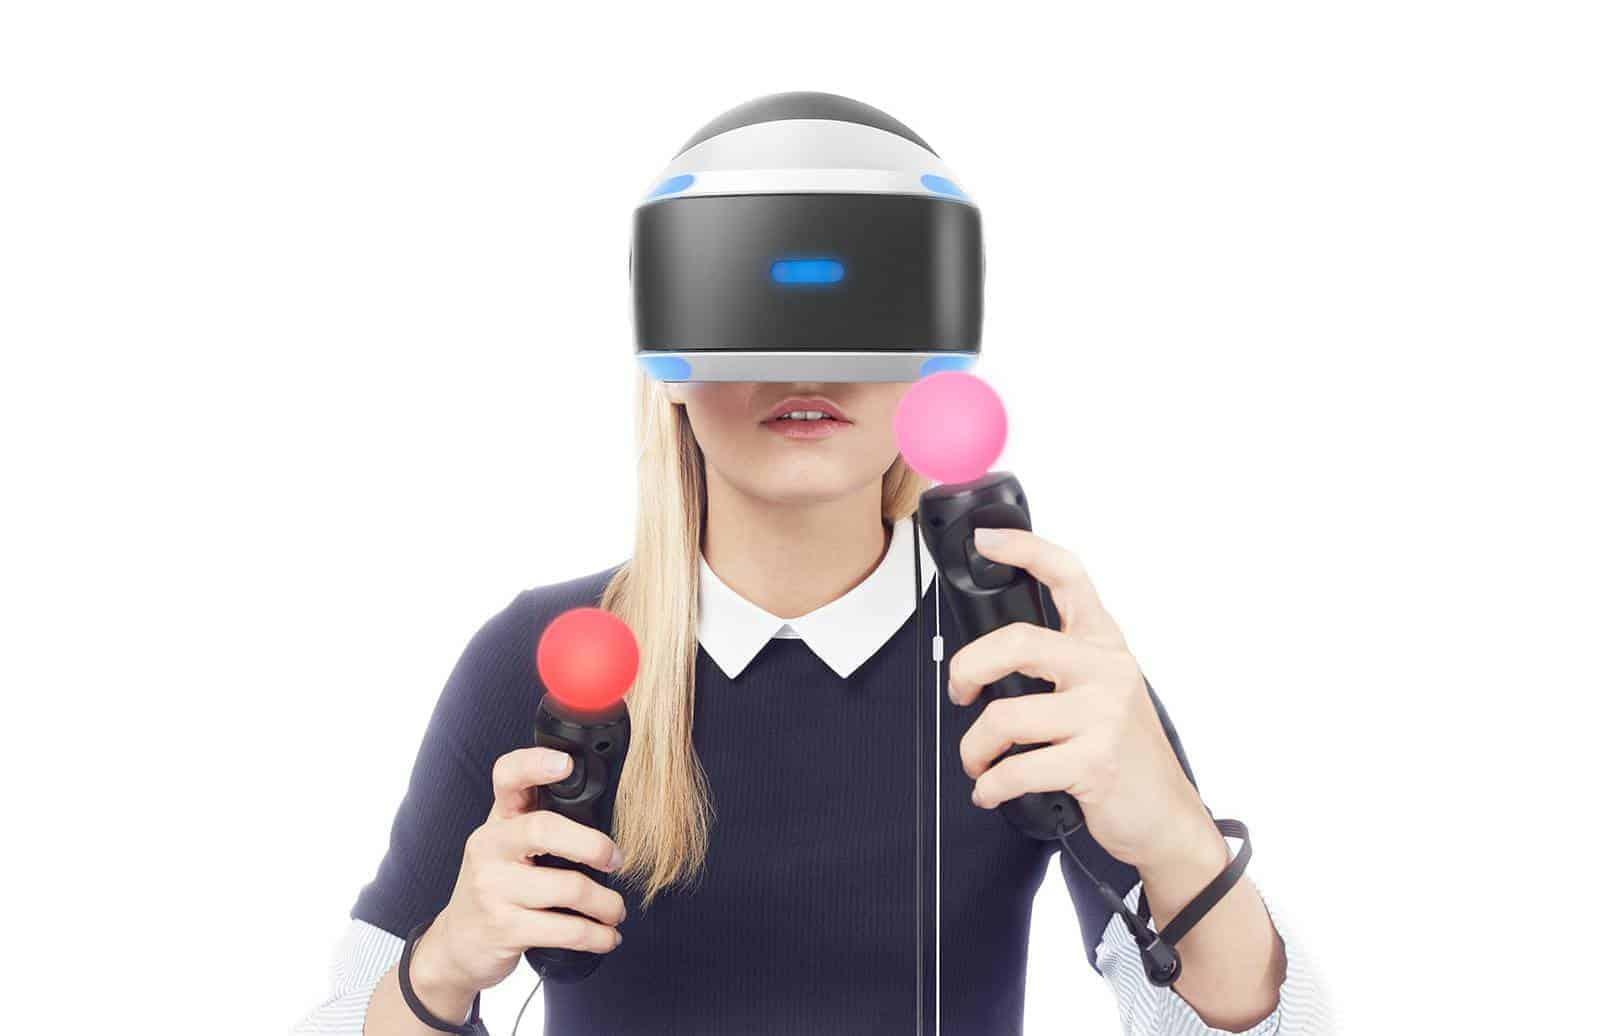 PlayStation VR 3 e1466185667720